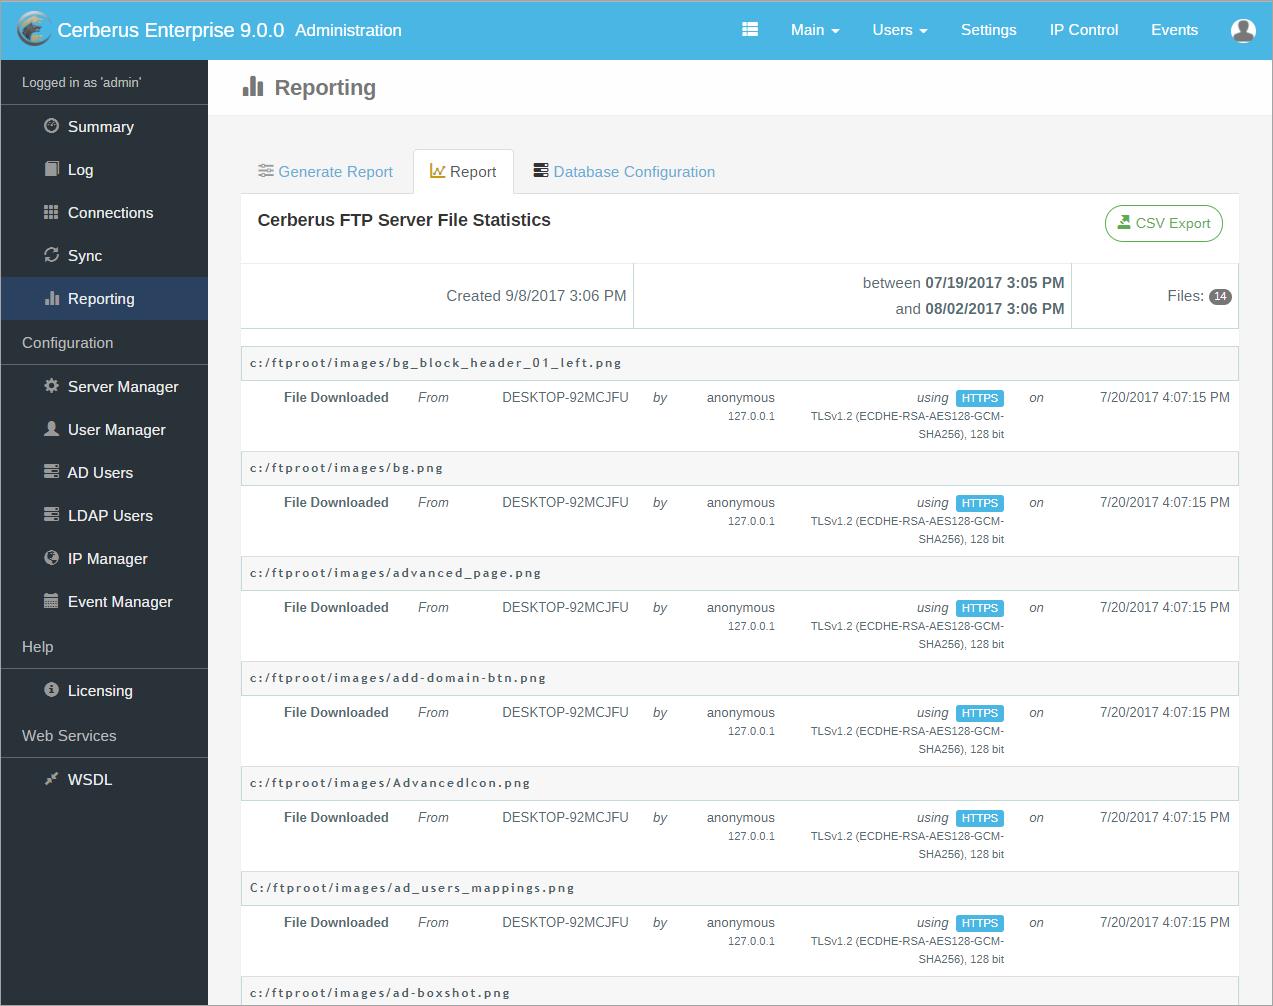 Cerberus FTP Server Demo - Cerberus FTP Server 9.0 File Report